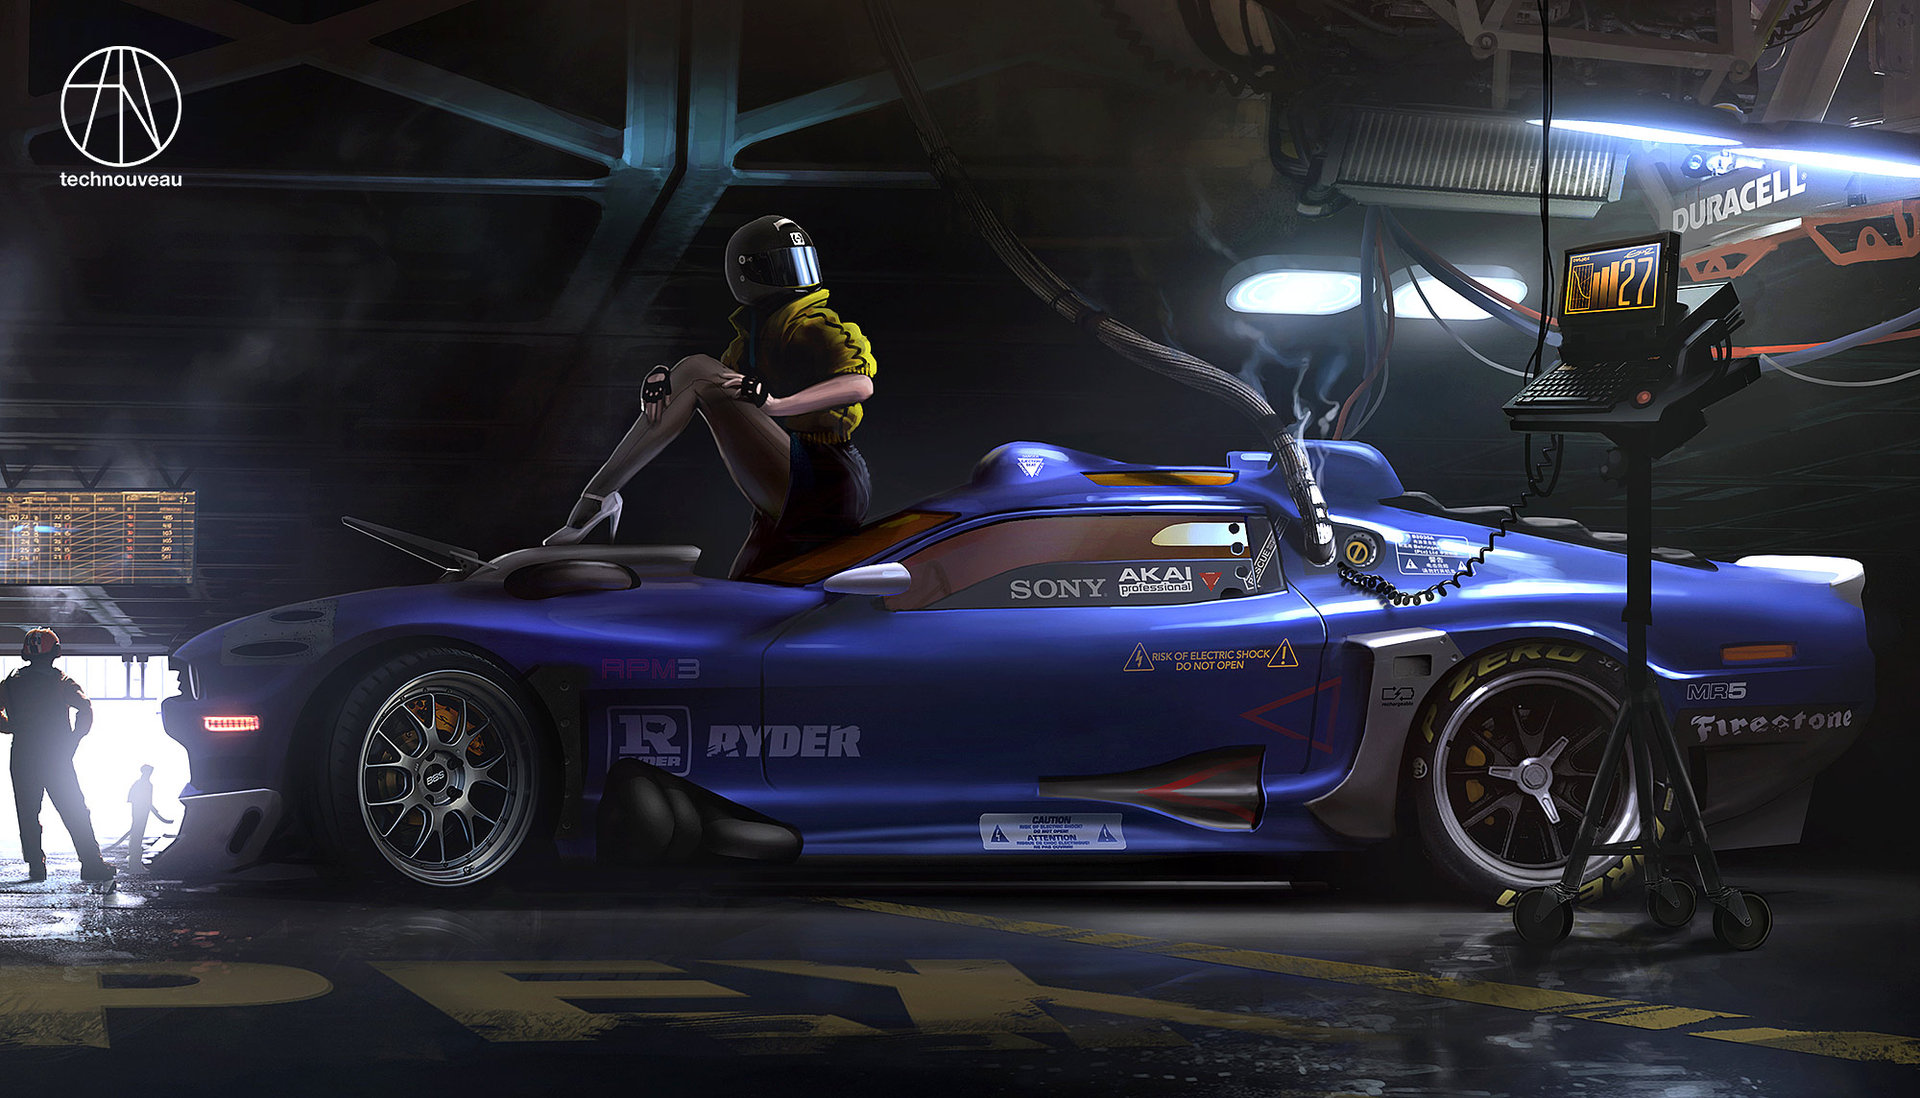 Racecarpinupny2flat5